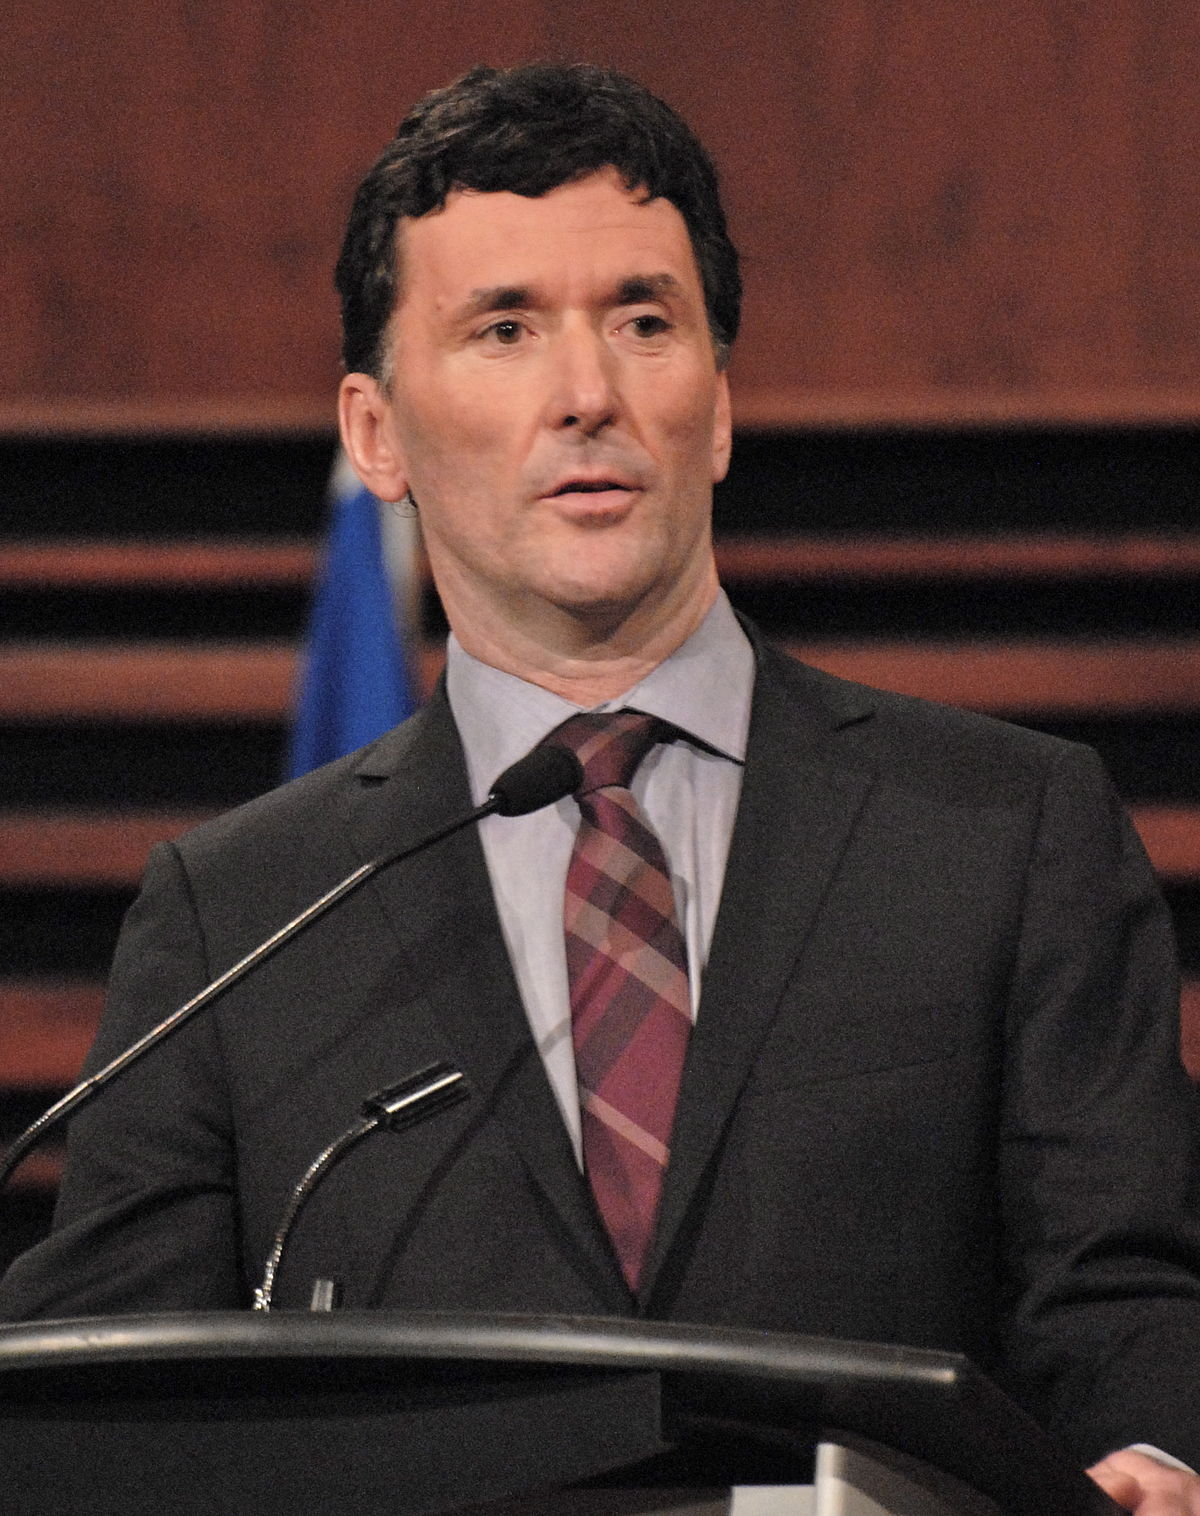 Canadian election Paul Dewar - Wikipedia